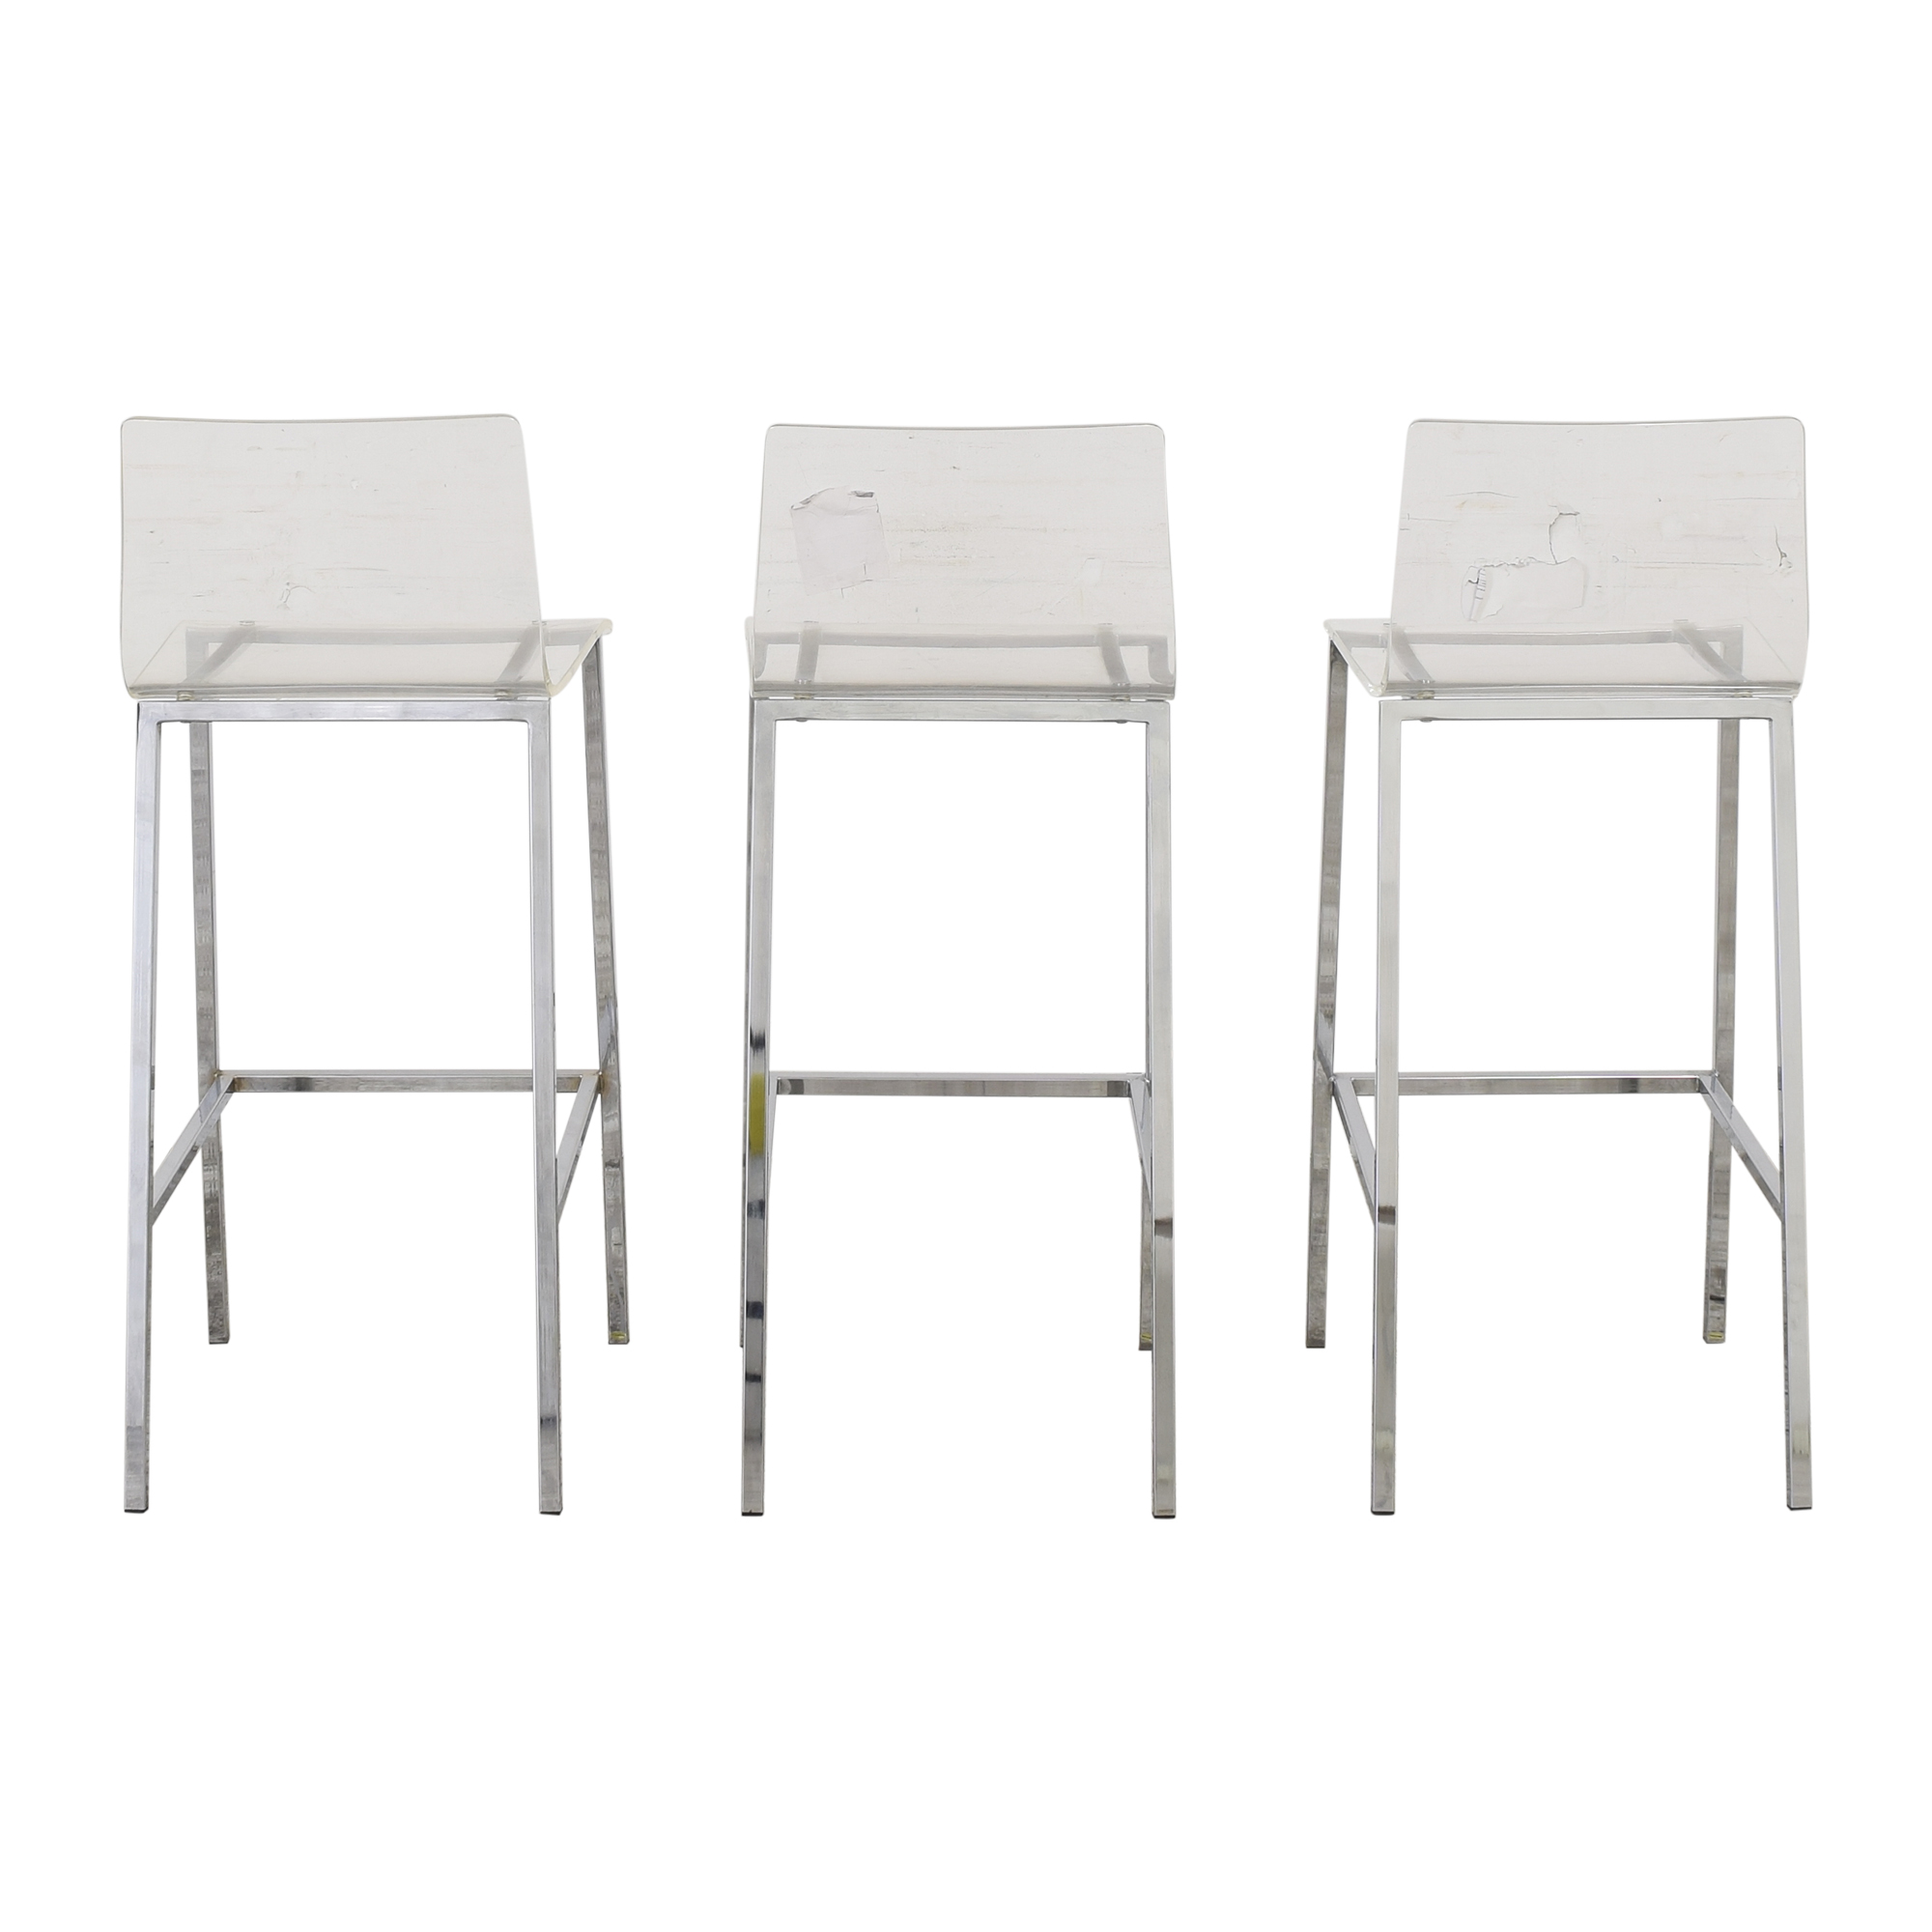 Cb2 Vapor Bar Stools / Chairs